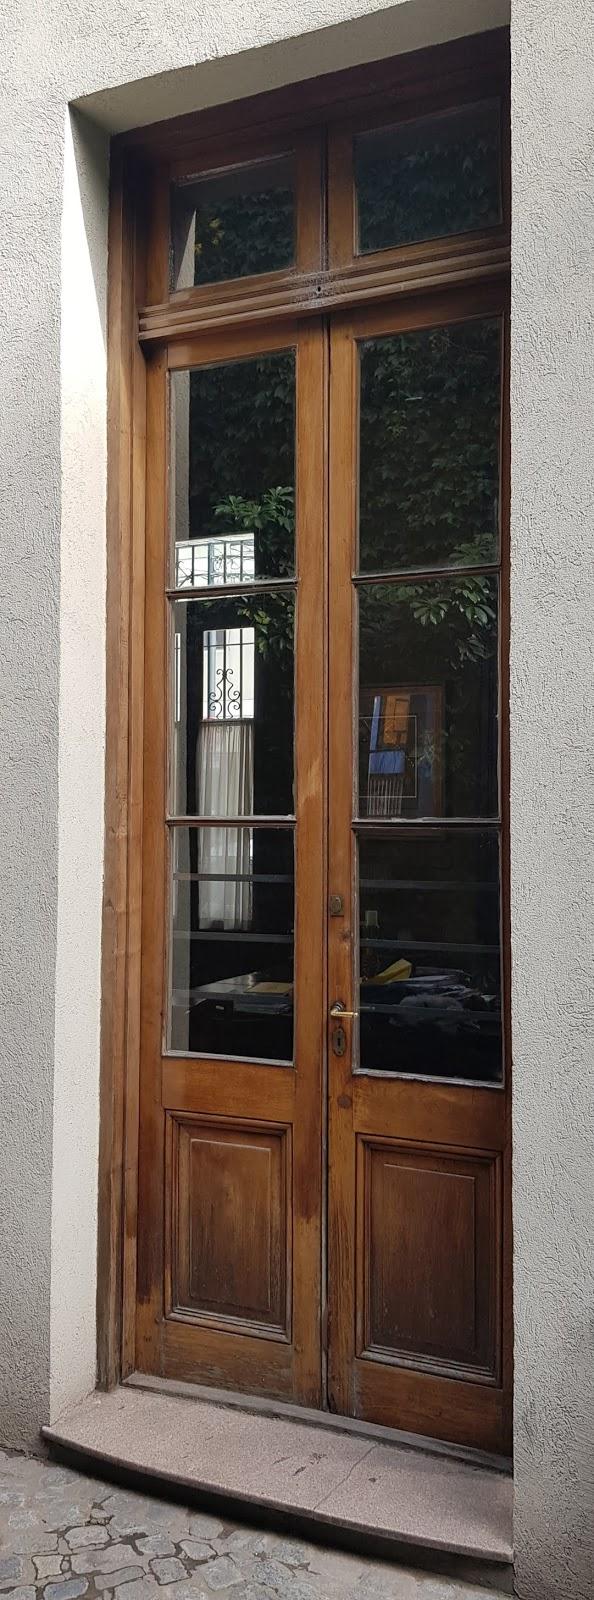 puerta interna casa chorizo